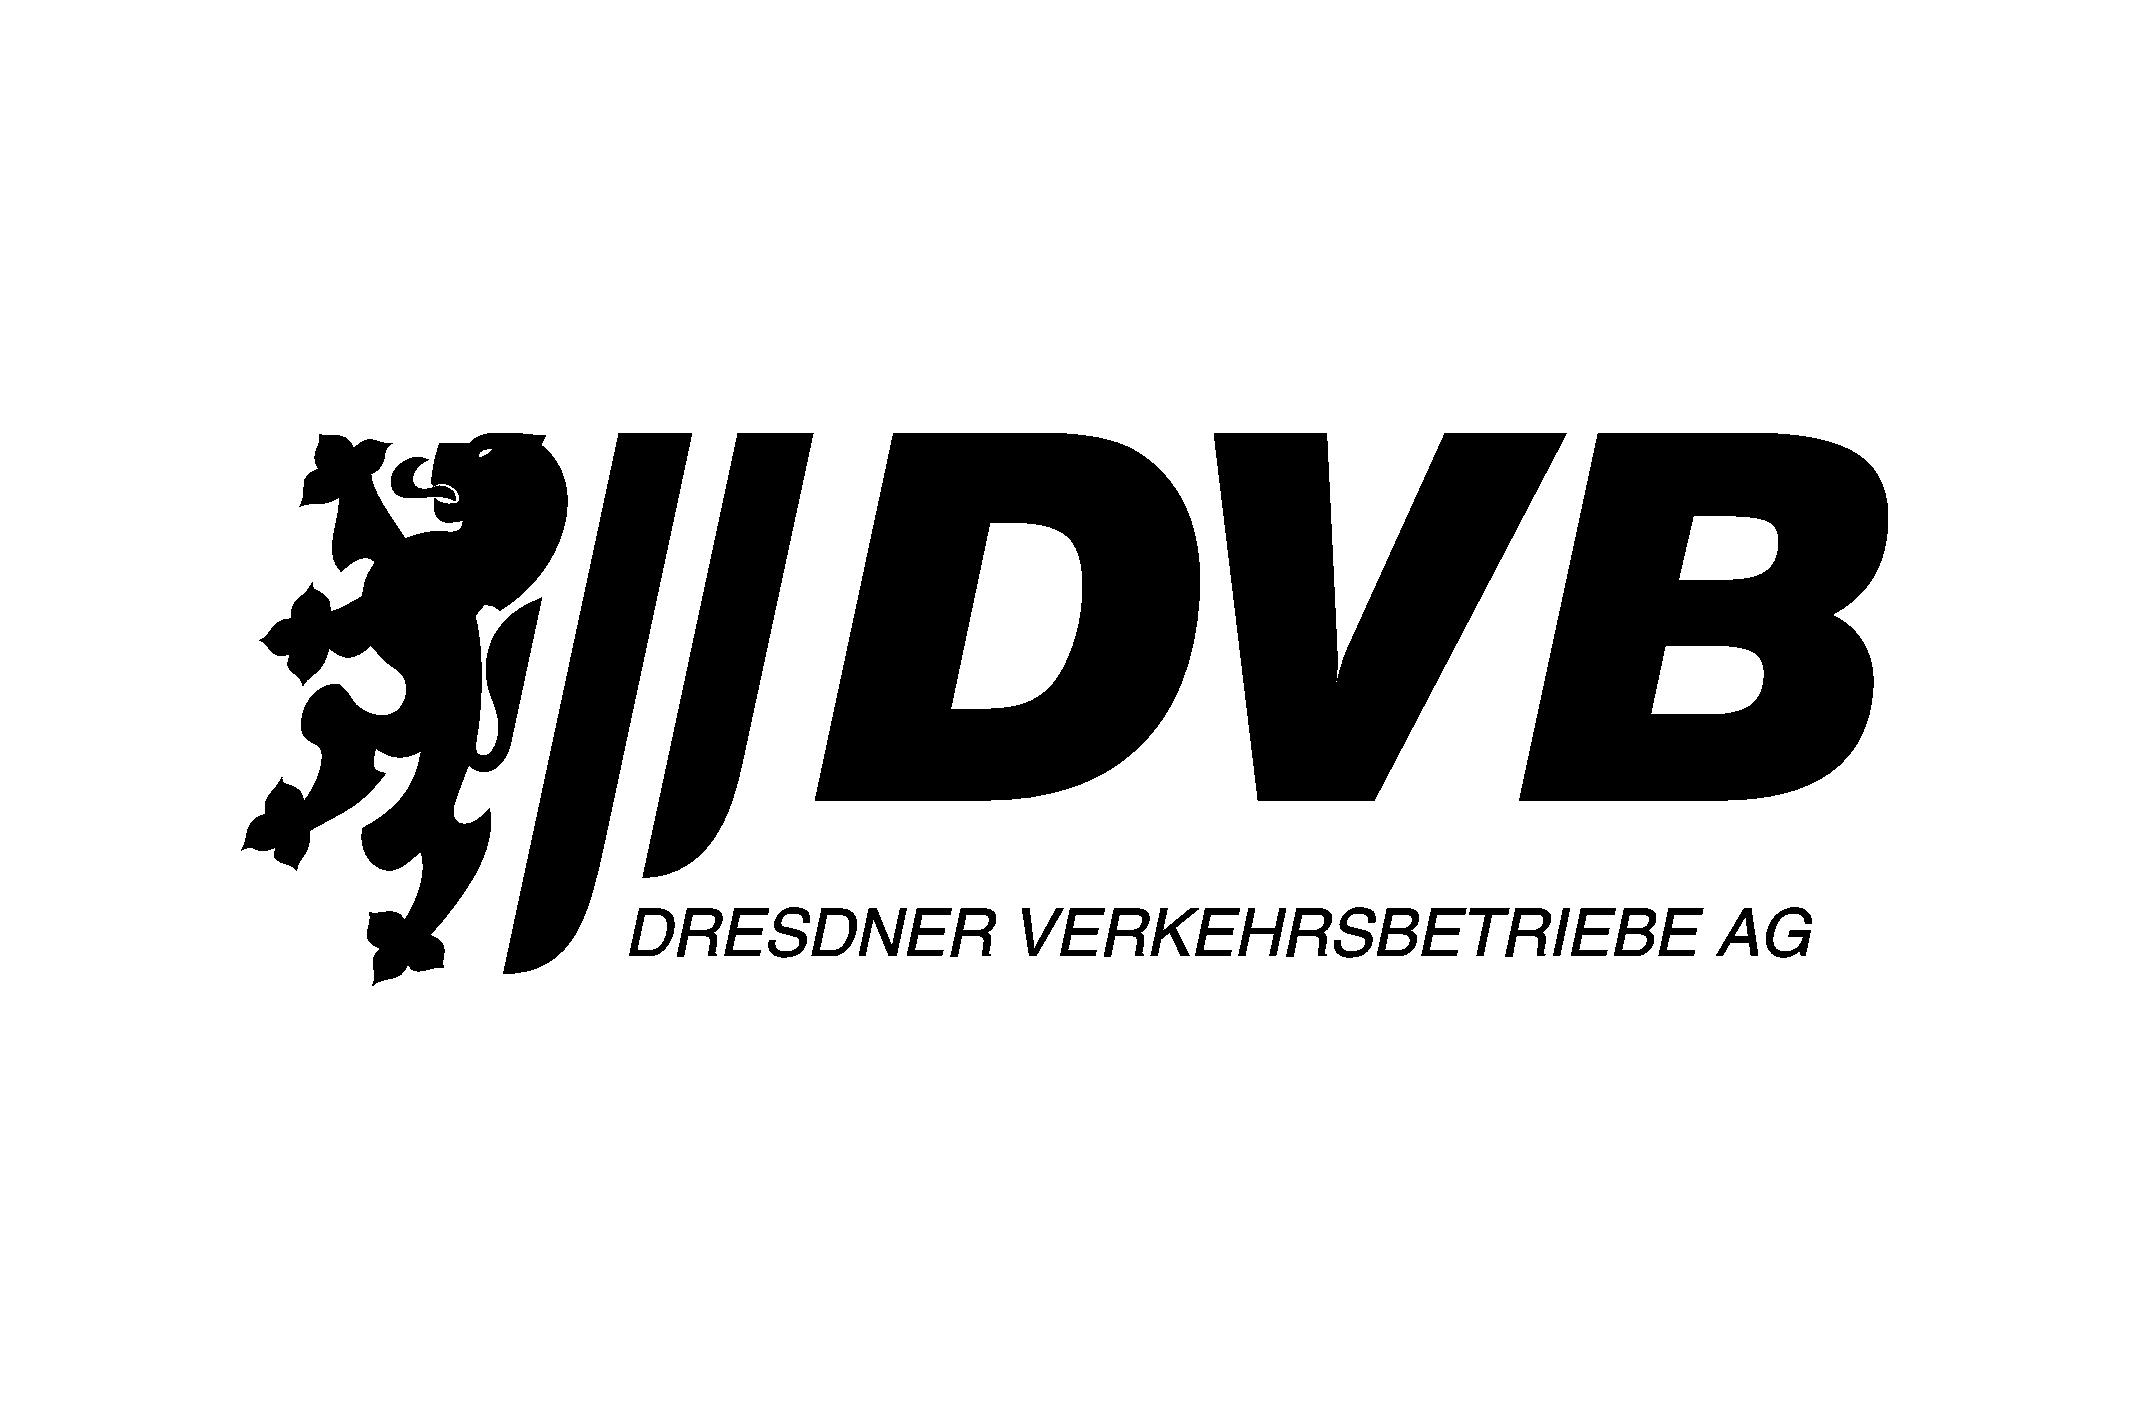 Logos Mobilitätspartner - Dresdner Verkehrsbetriebe